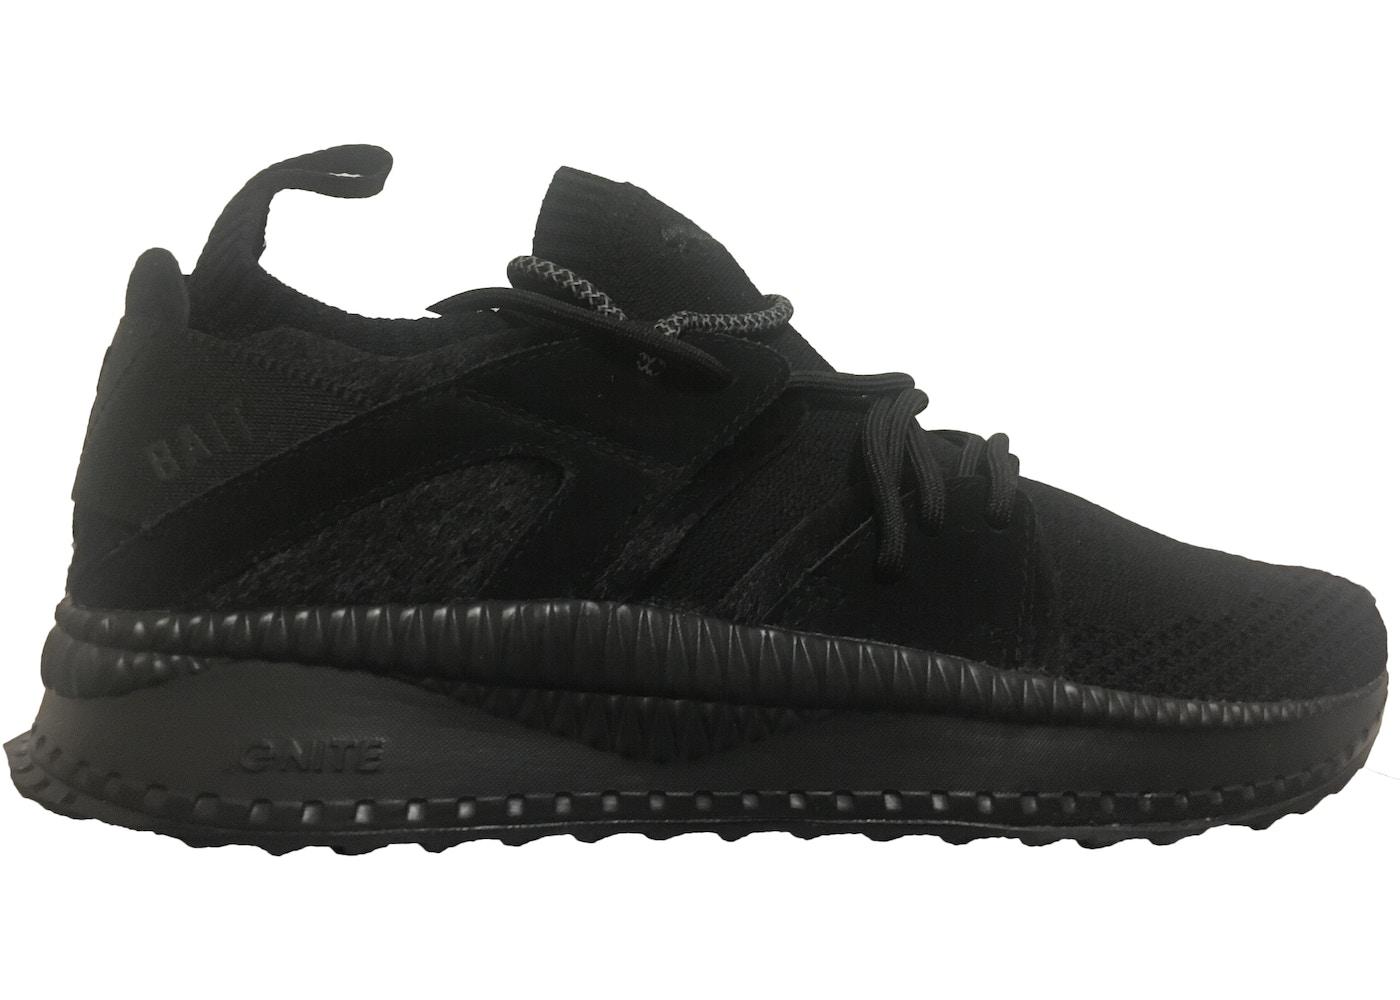 ae2444f1a Puma Size 9 Shoes - Price Premium